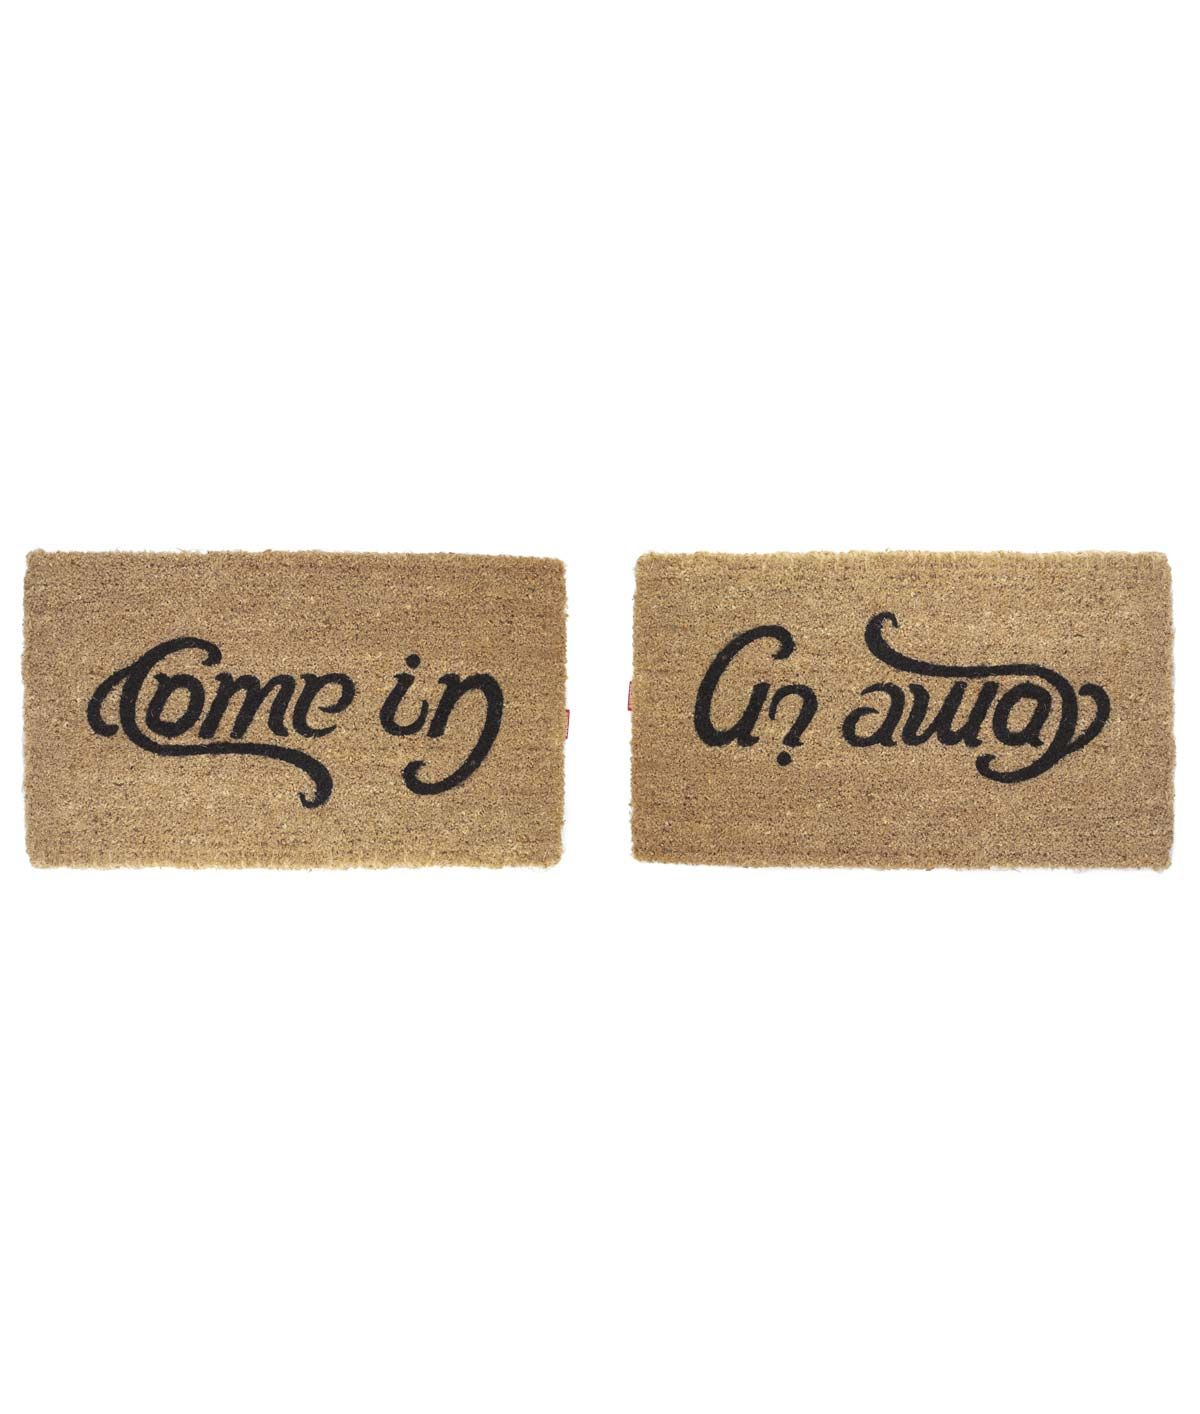 Come in go away doormat doormat come in go away humor